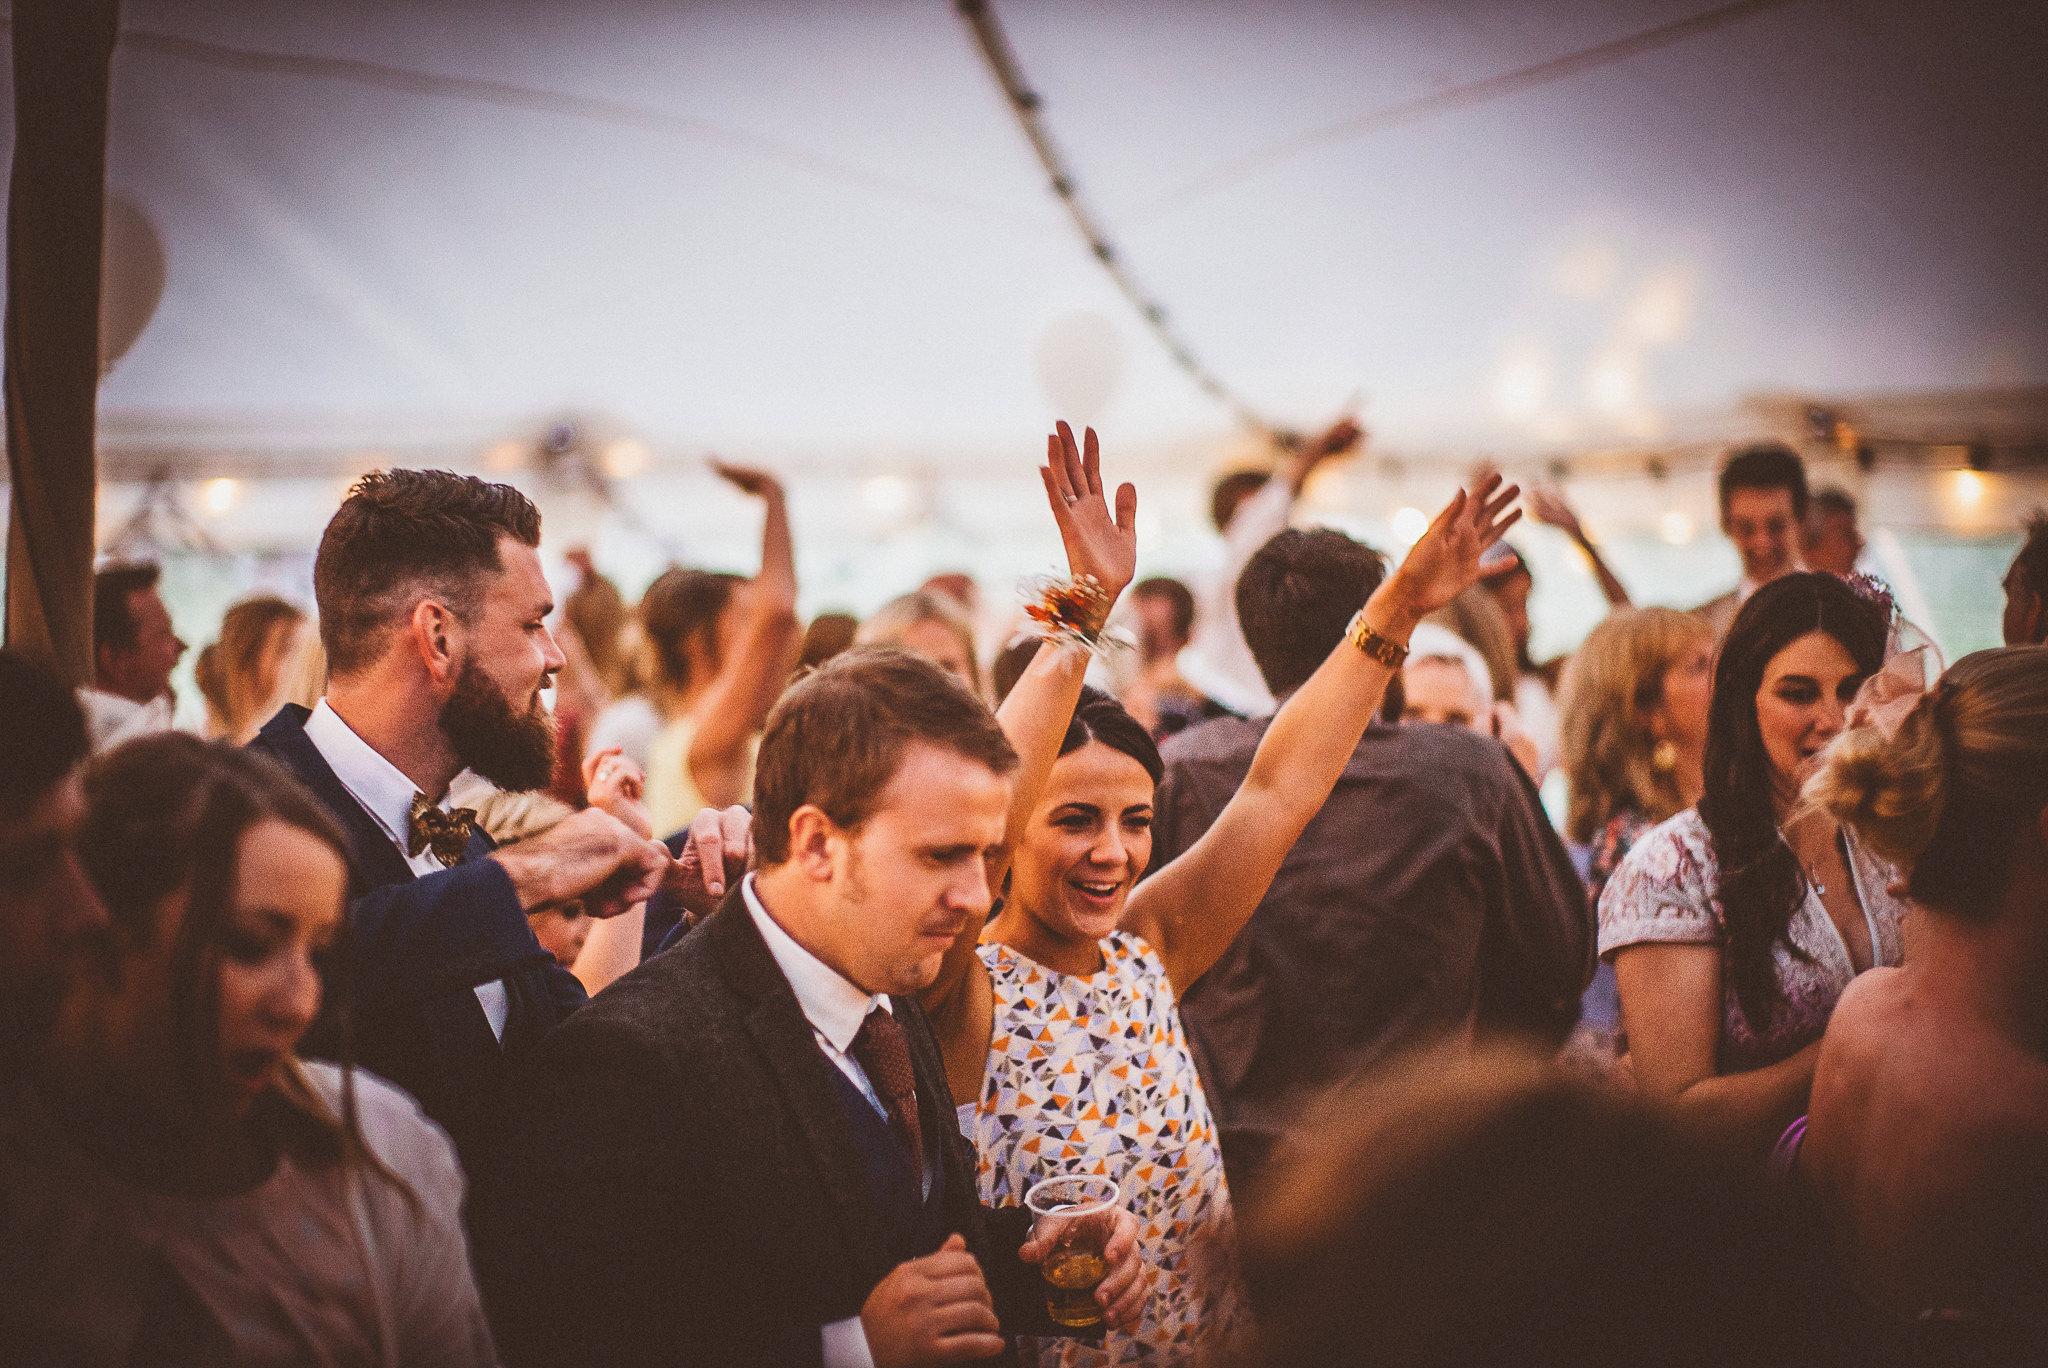 paul-marbrook-Farm-Wedding-Photographer-Lancashire-90107